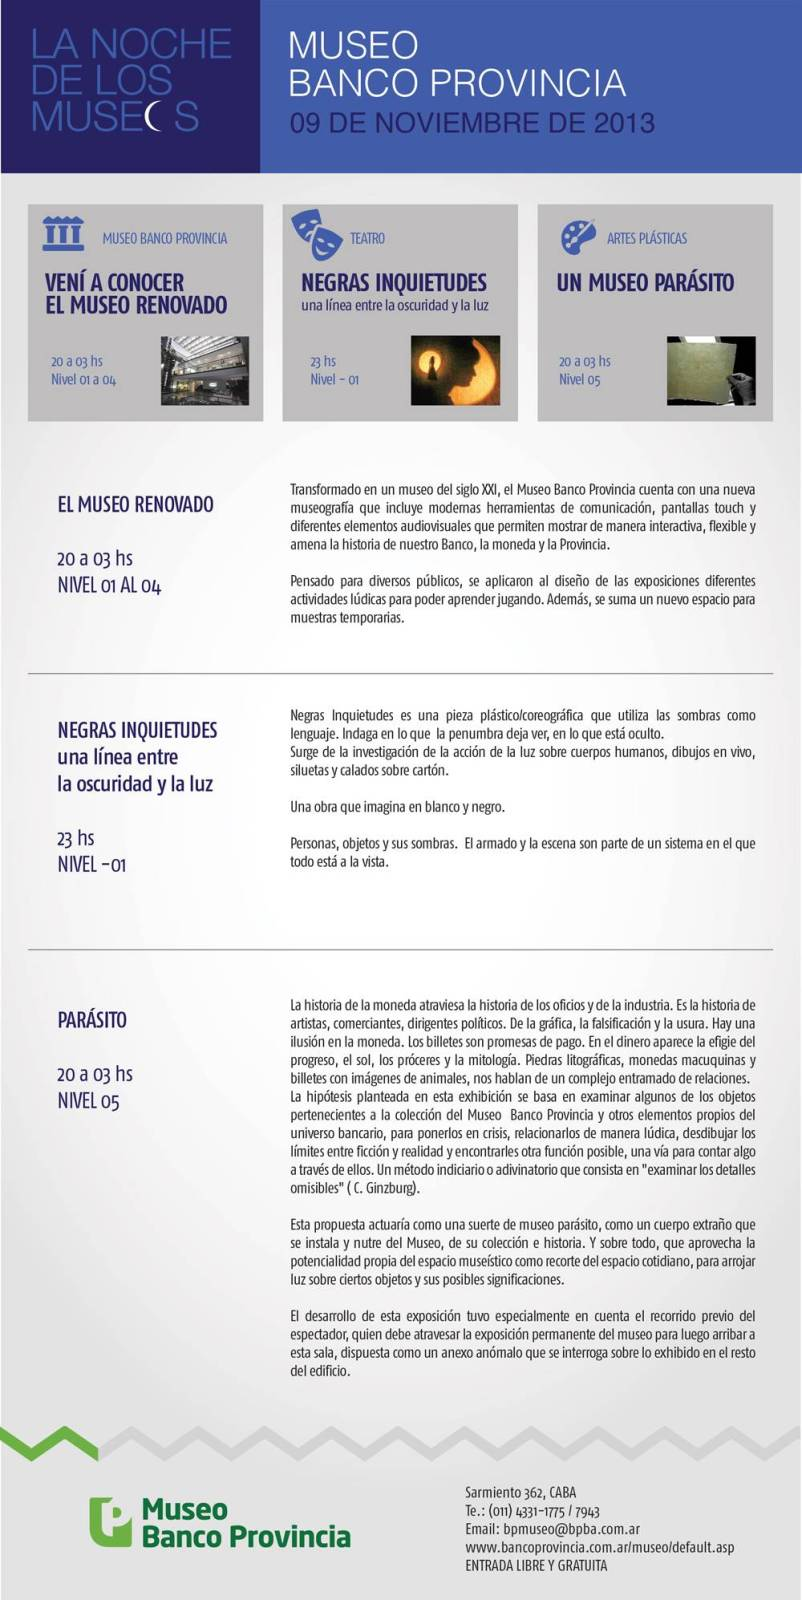 Foro de Numismática Argentina - Portal 2r4hl38